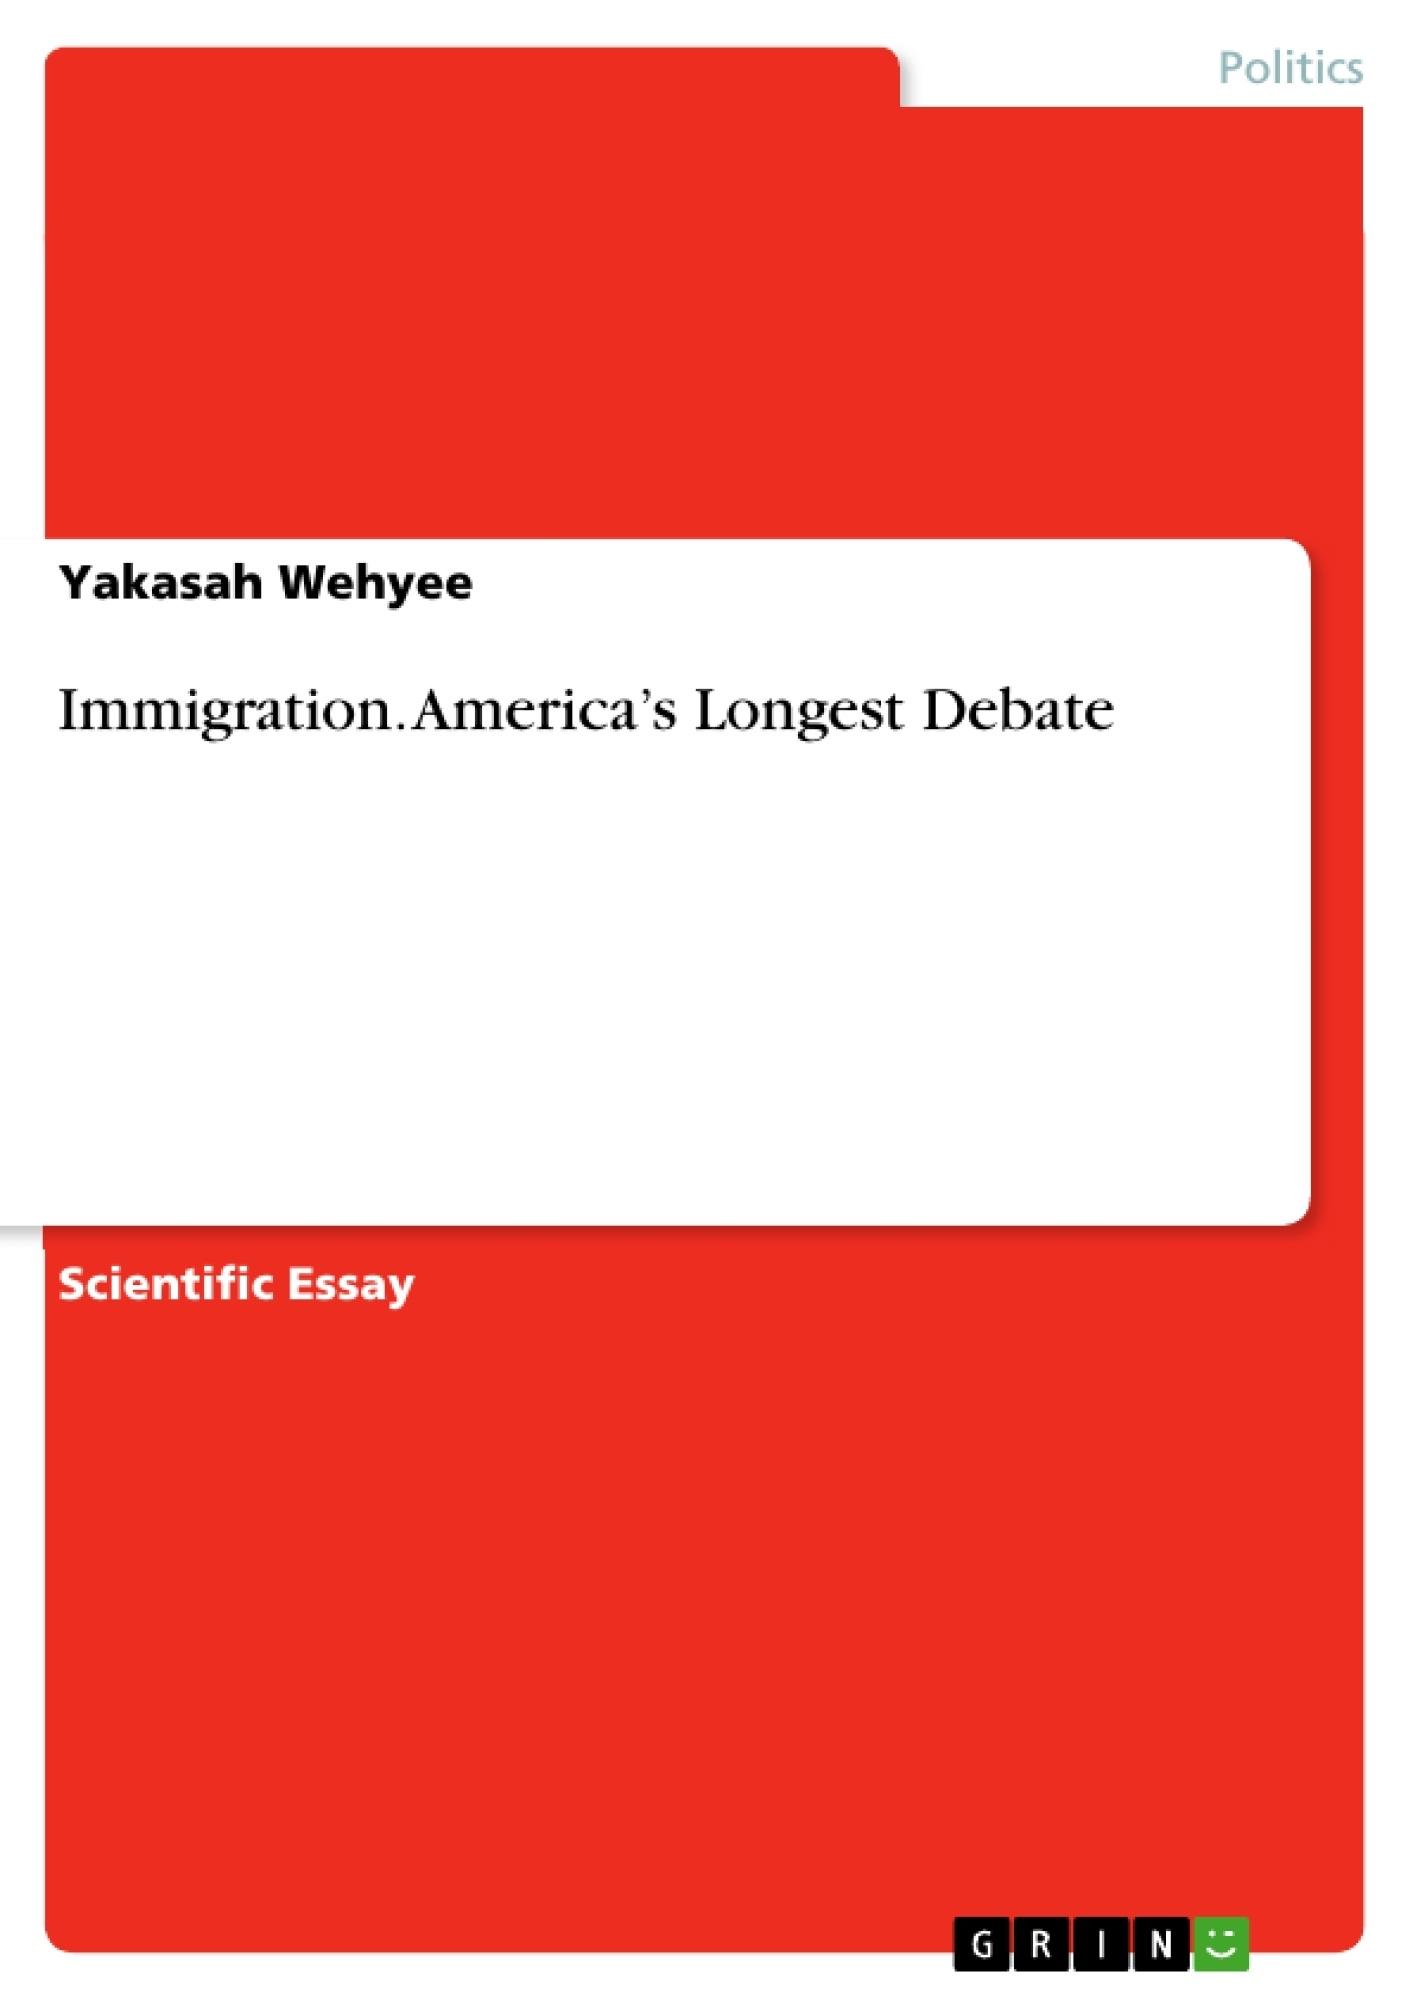 Title: Immigration. America's Longest Debate